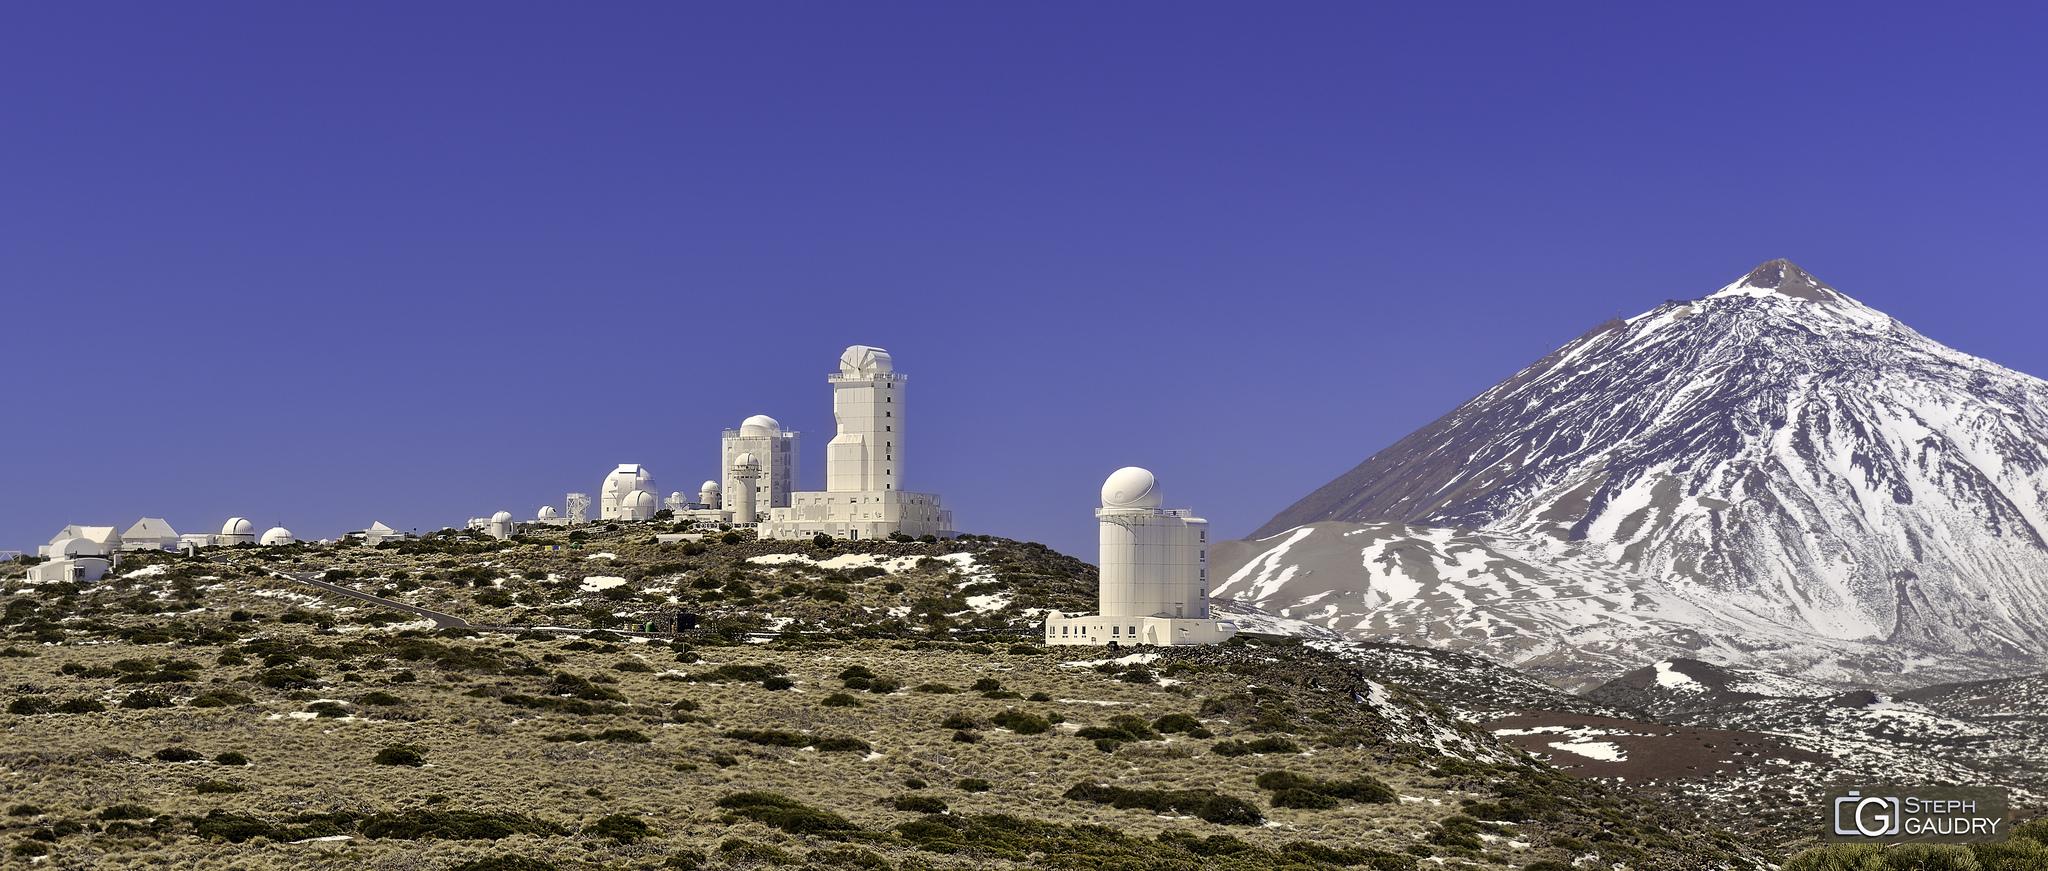 Les observatoires du Teide [Klik om de diavoorstelling te starten]